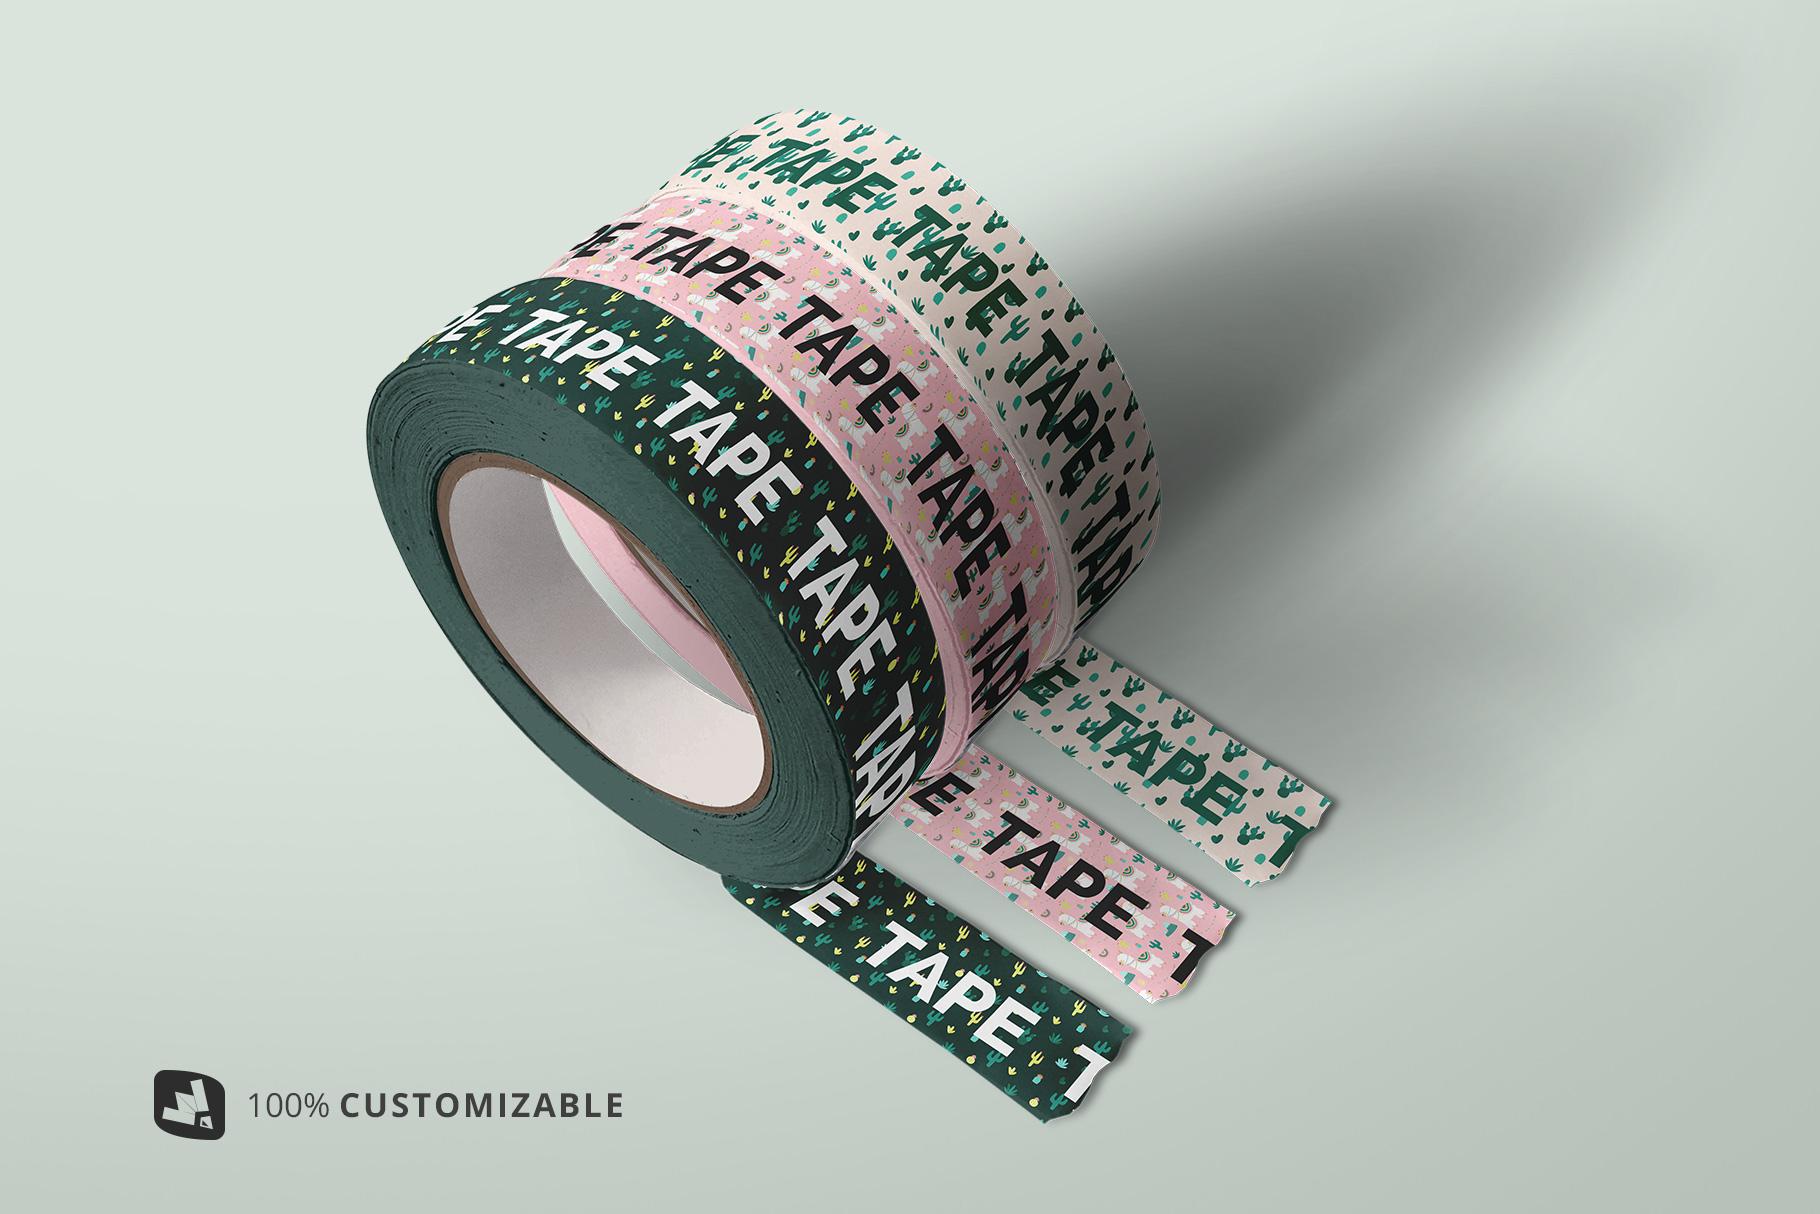 customization of the themed washi tape roll mockup